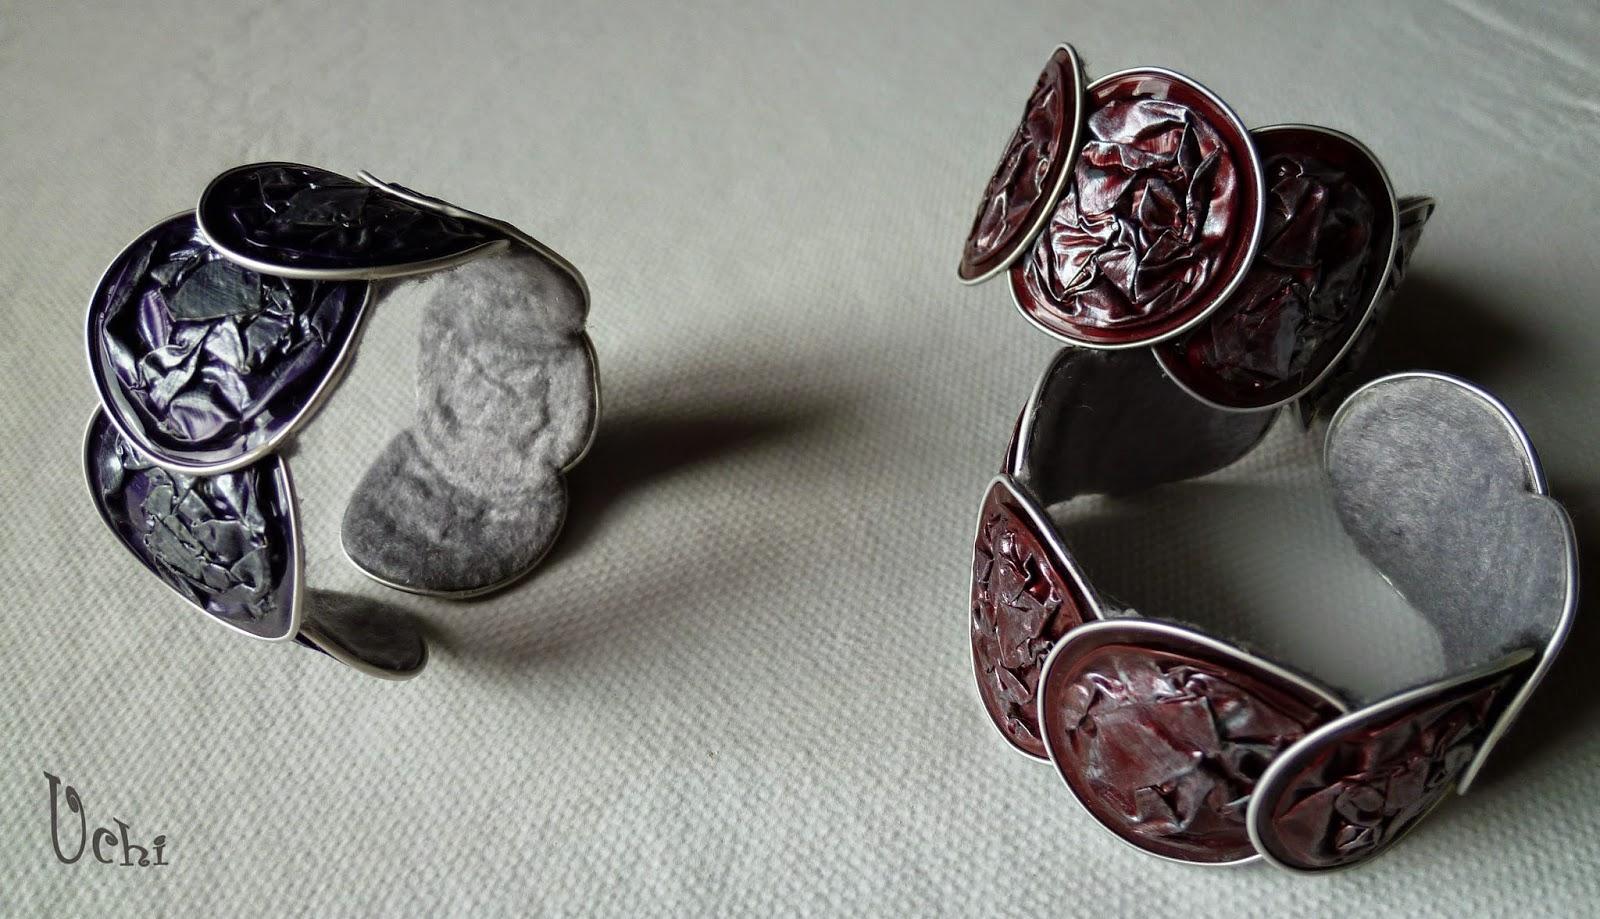 bisuteria, jewelry, pulsera, bracelet